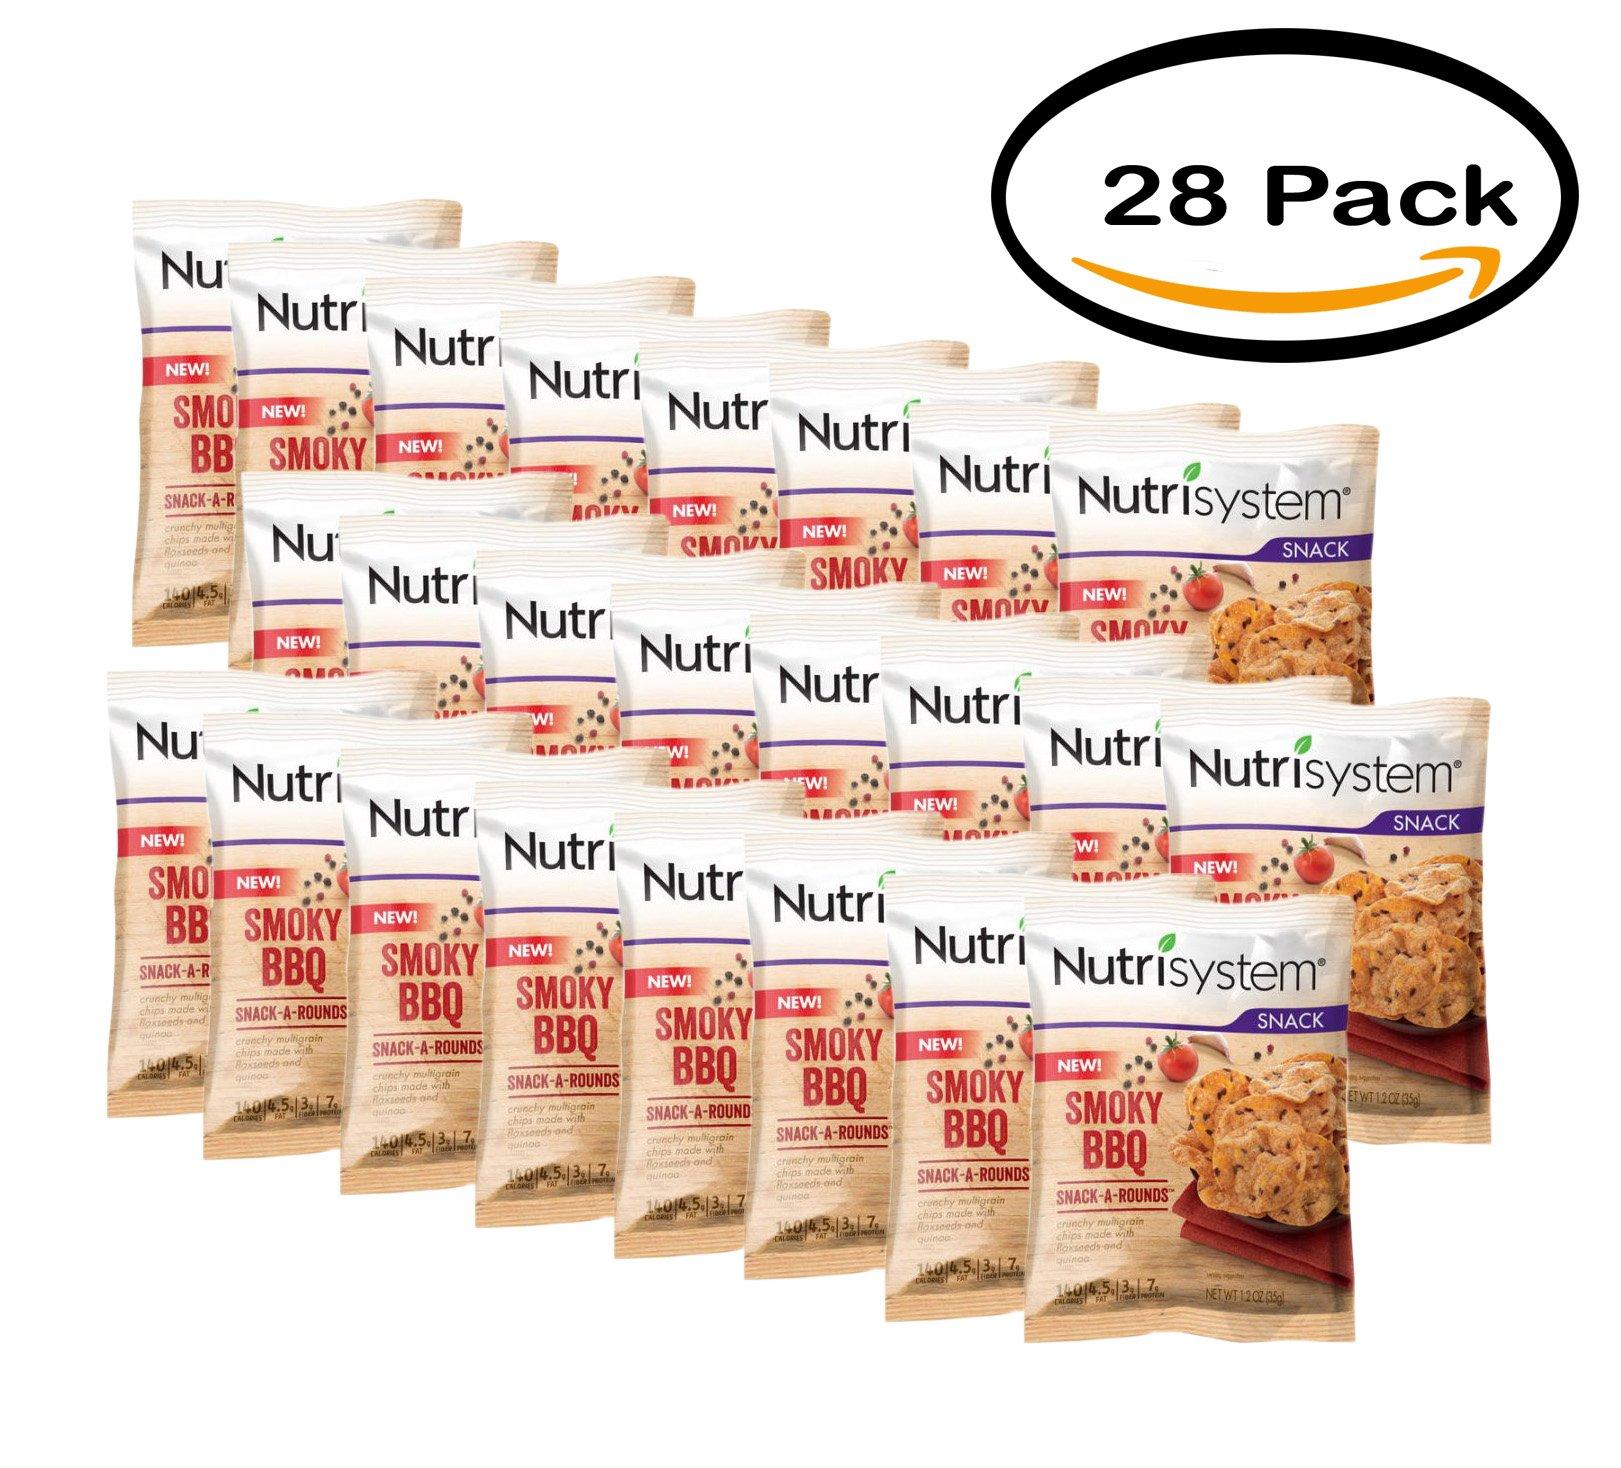 PACK OF 28 - Nutrisystem Smoky BBQ Snack-a-Rounds, 1.2 oz by Nutrisystem